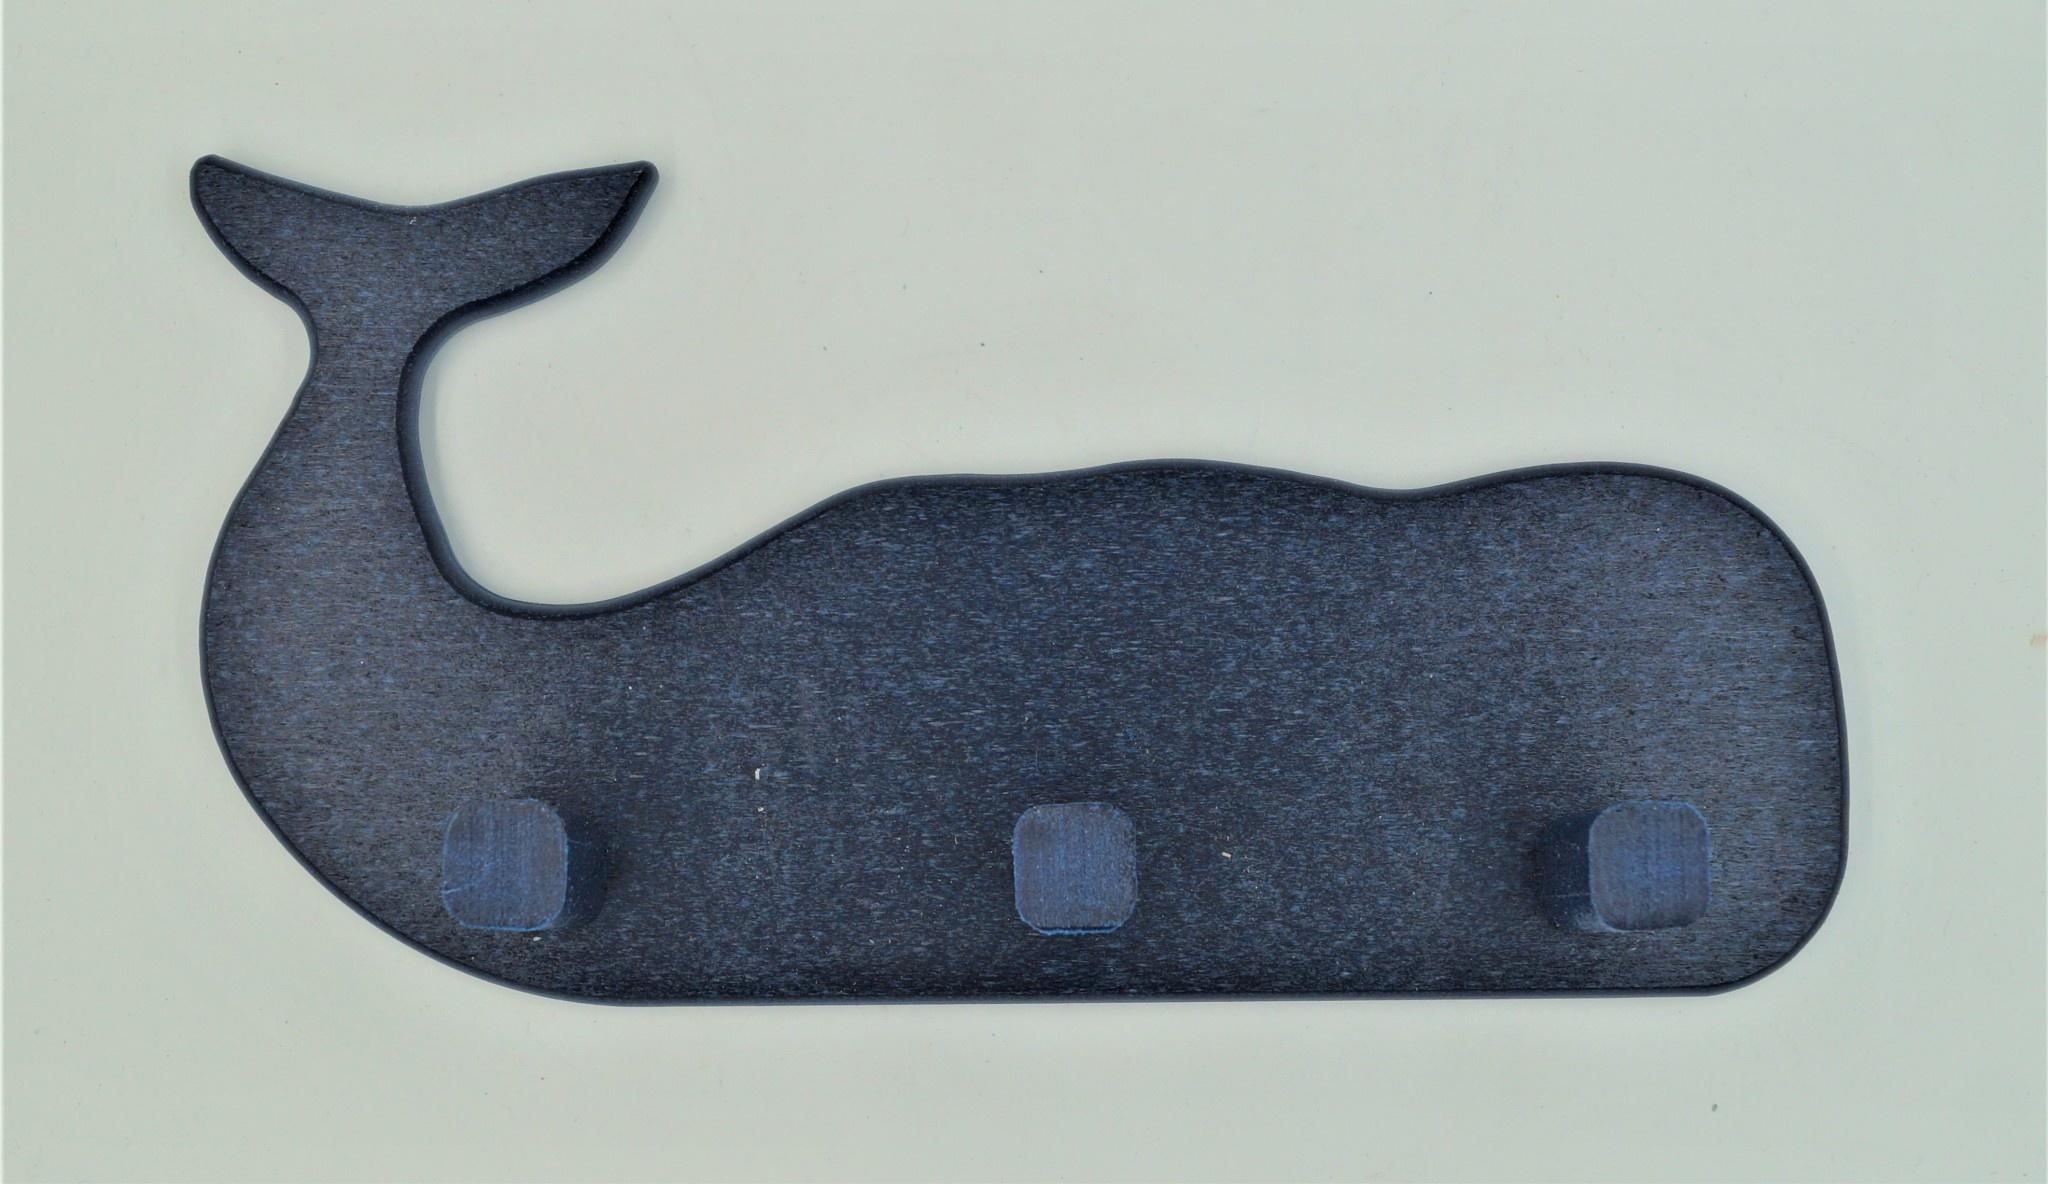 Whale Navy 3 Peg